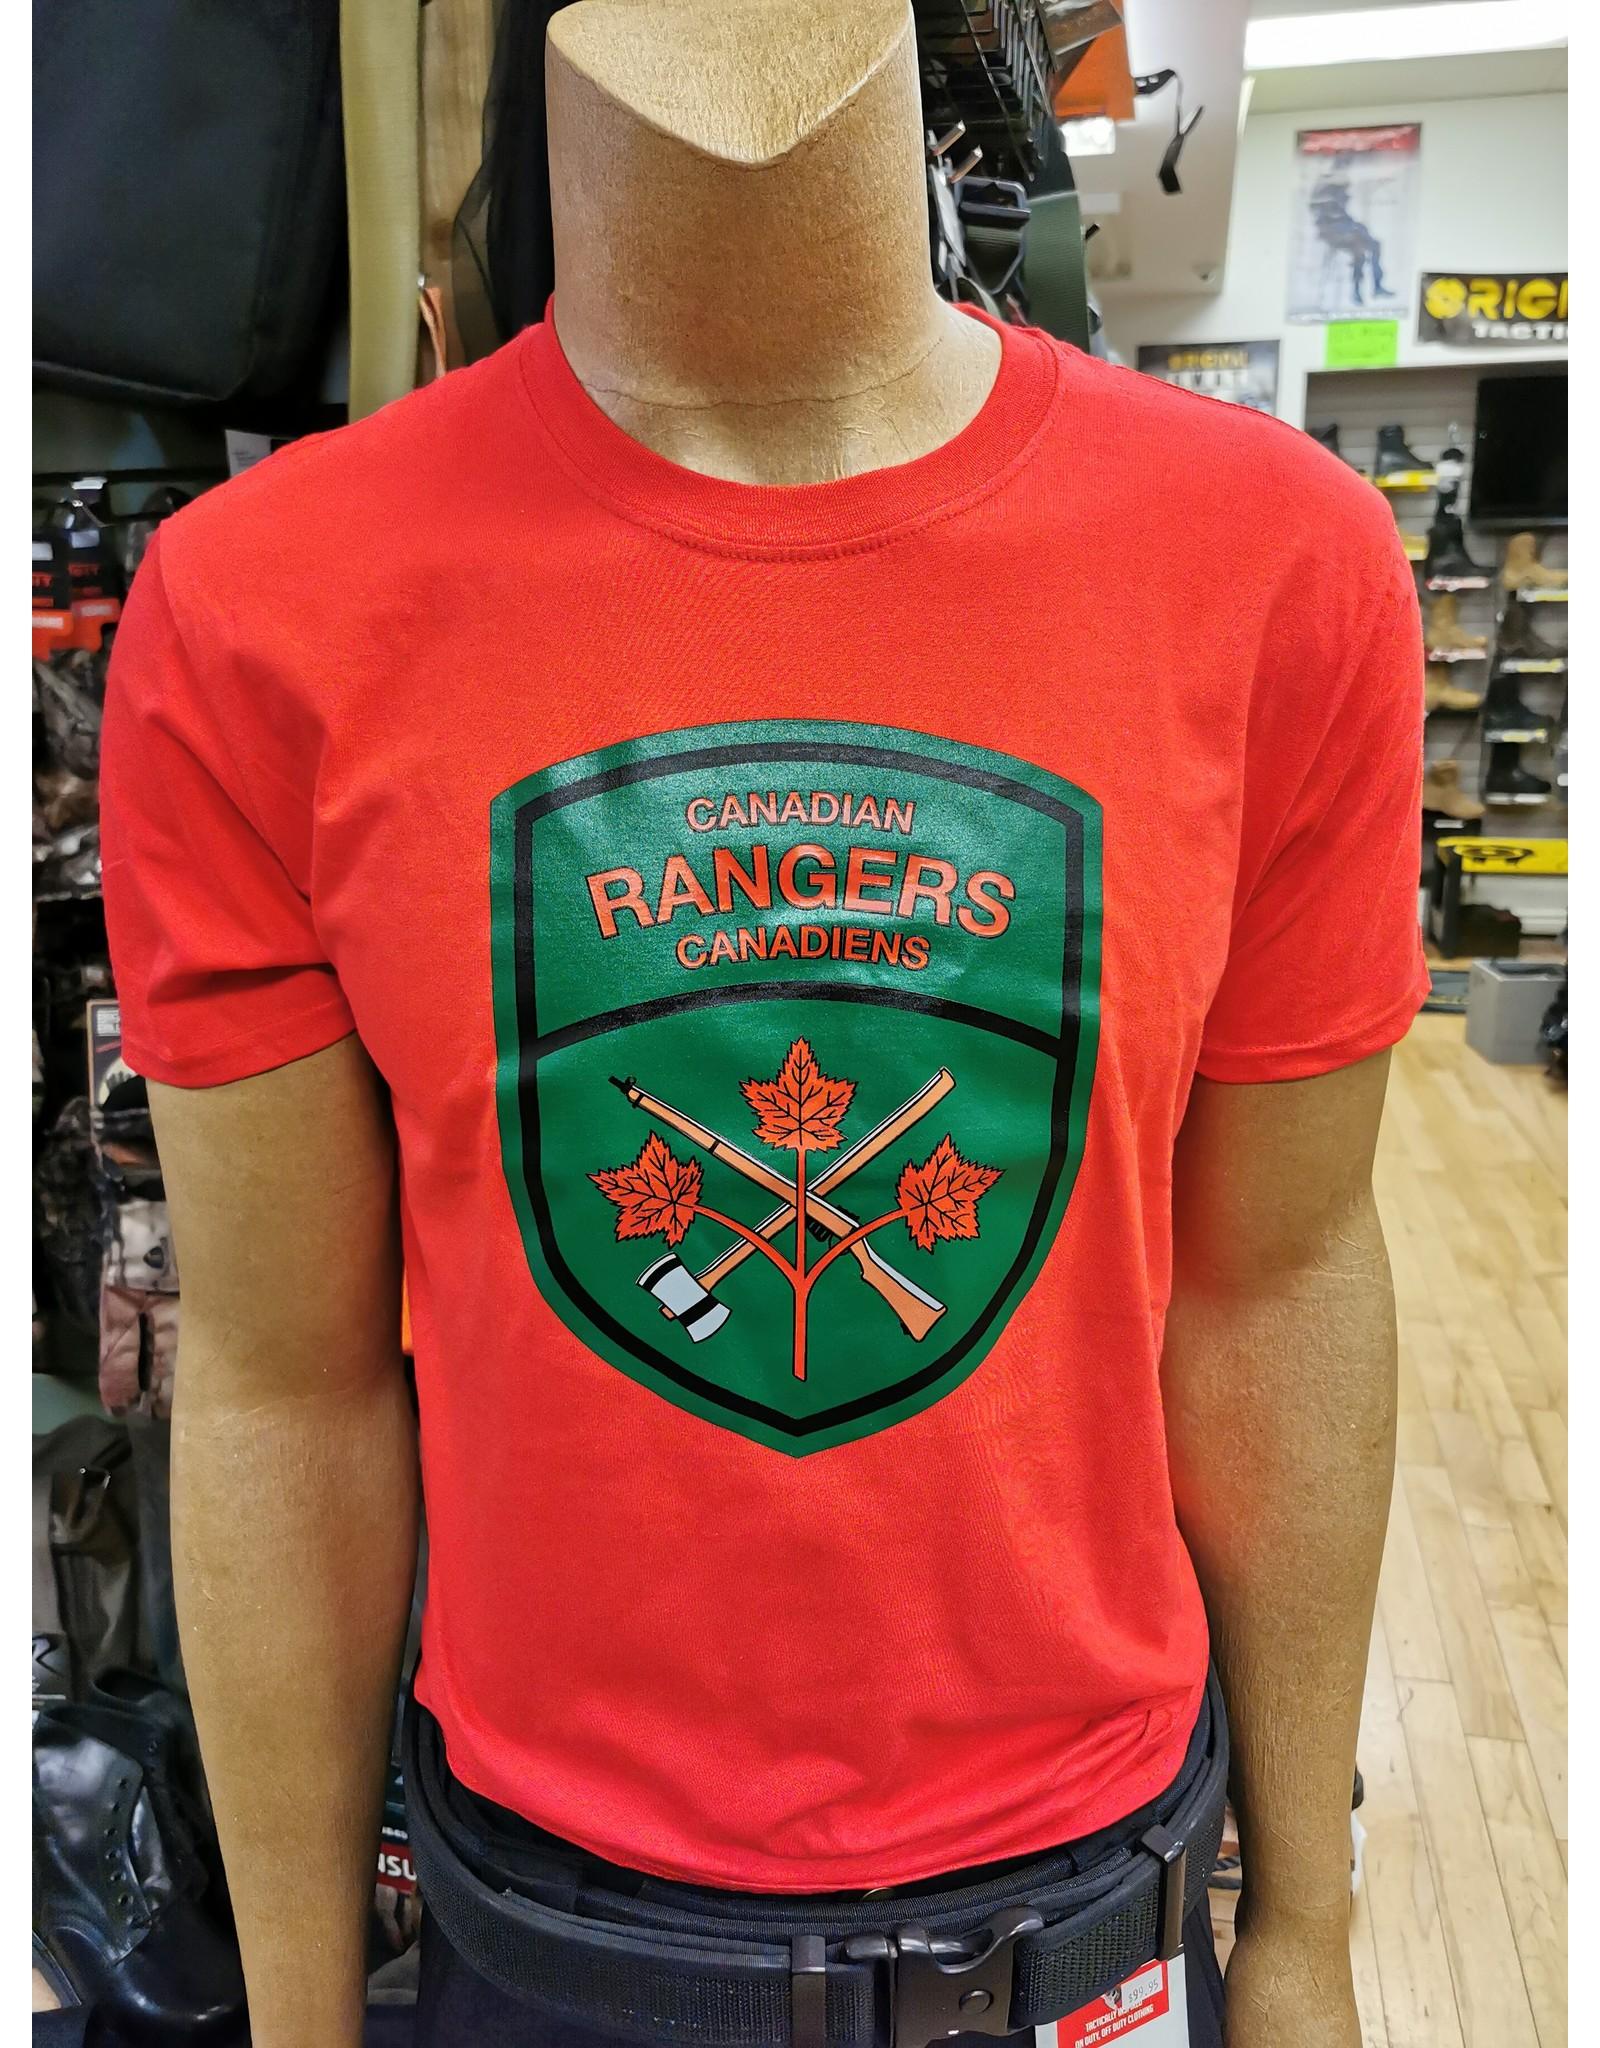 GILDAN CANADIAN RANGERS T-SHIRT